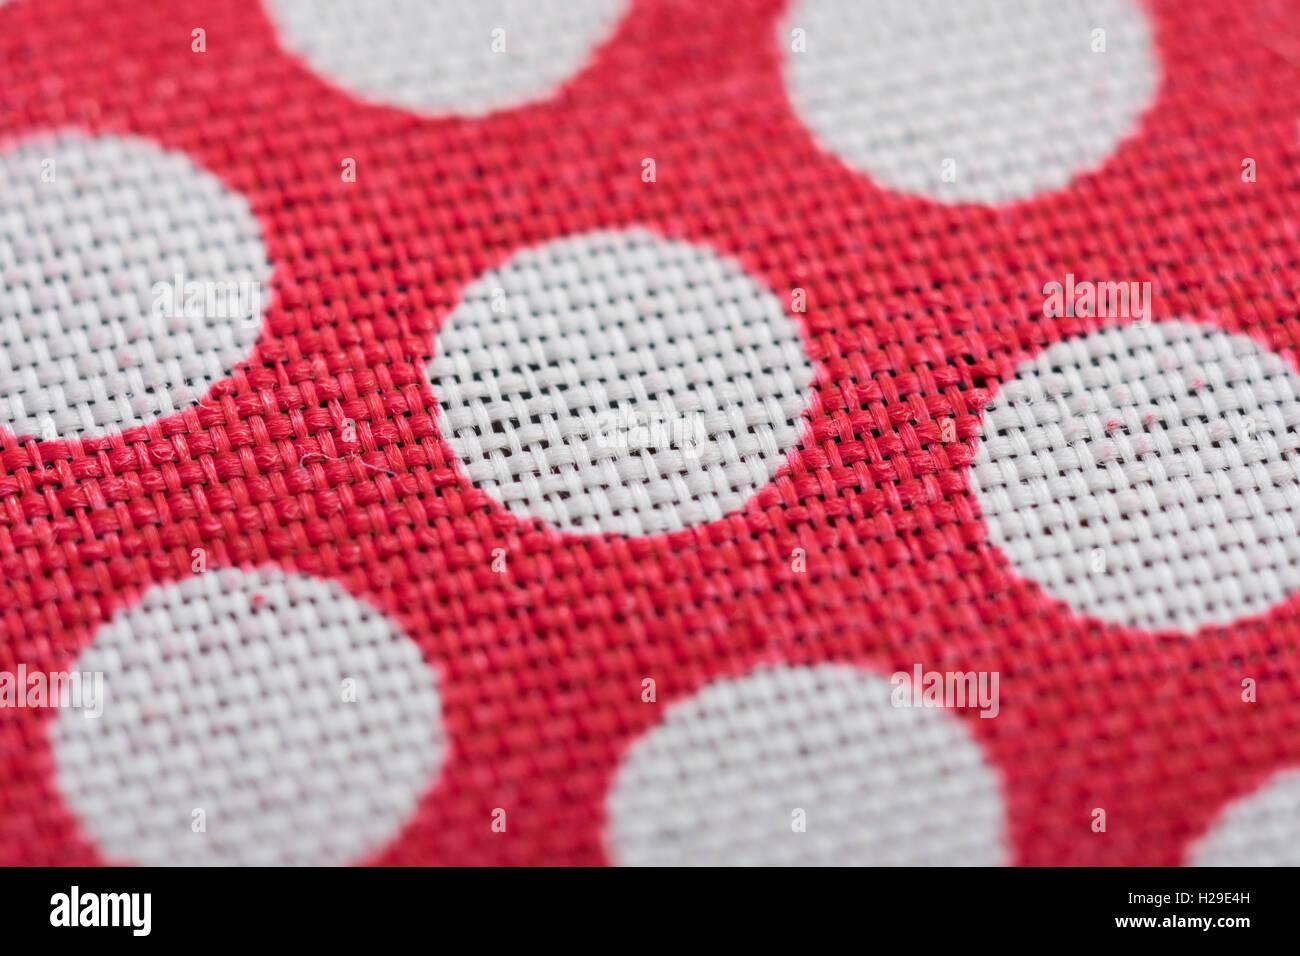 Abstract red-white polka dot material. Narrow DoF Macro-shot of dots. Concept 'International Dot Day' and - Stock Image